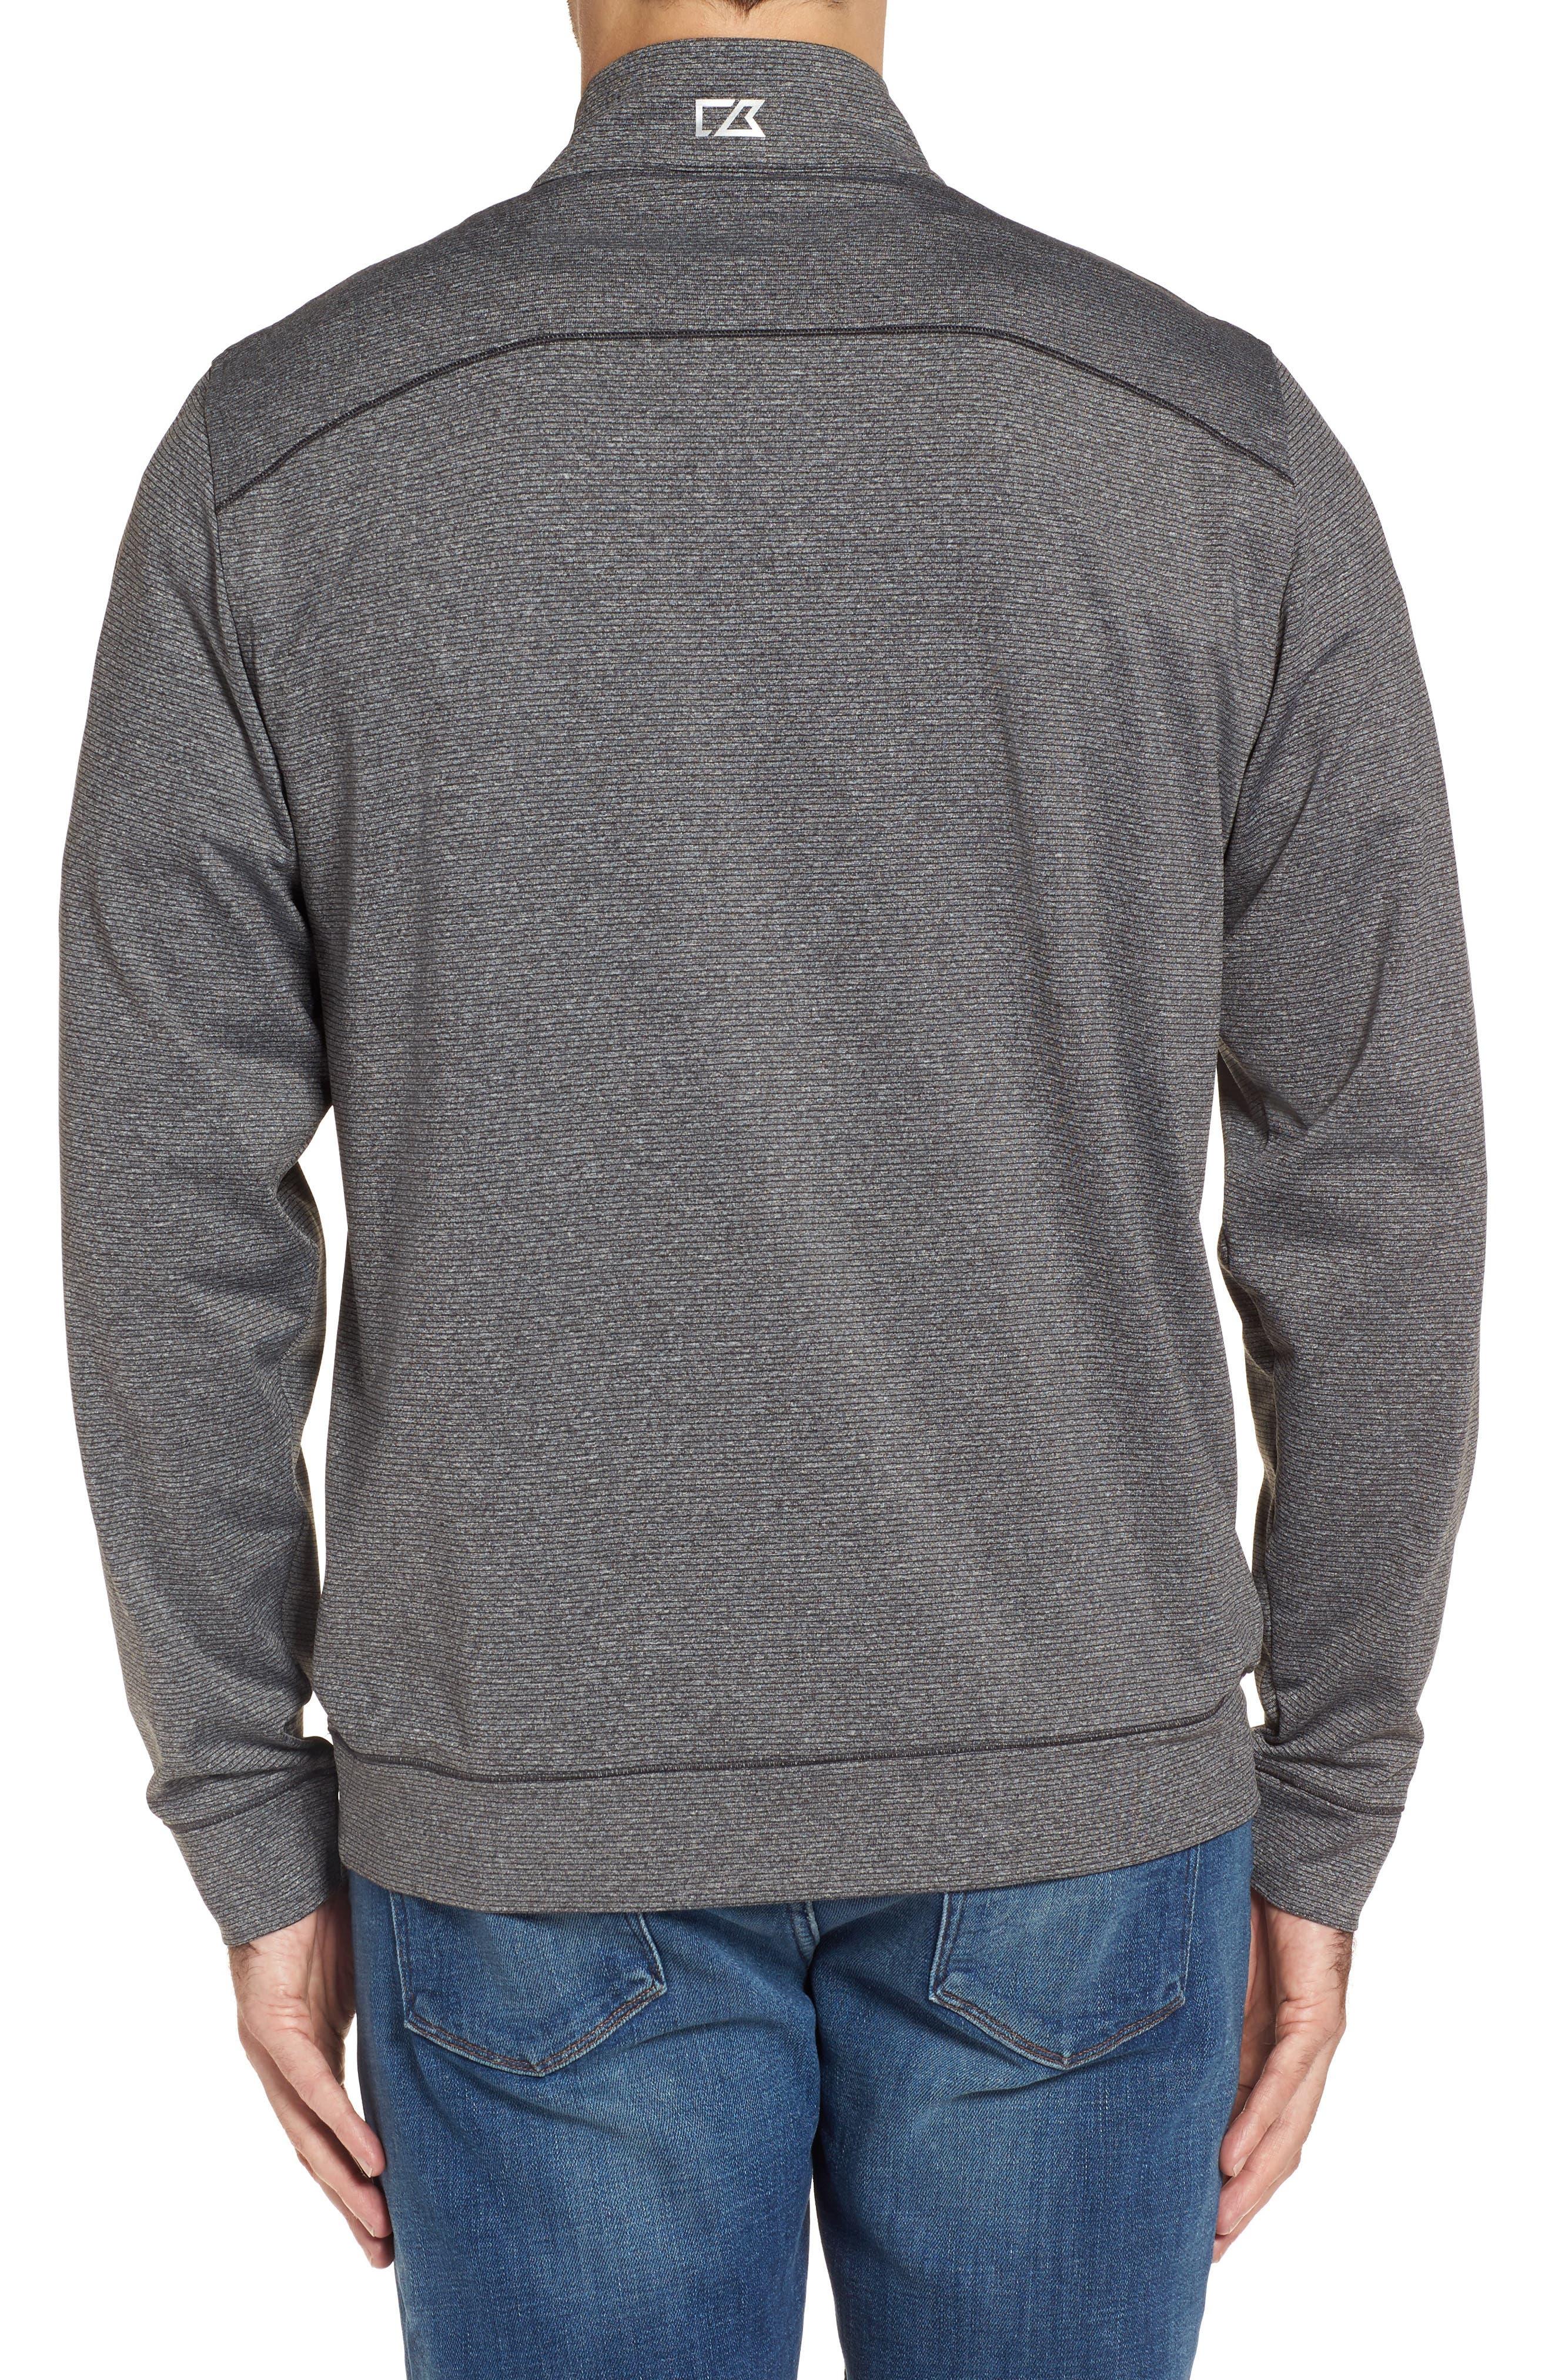 Shoreline - Philadelphia Eagles Half Zip Sweatshirt,                             Alternate thumbnail 2, color,                             Charcoal Heather